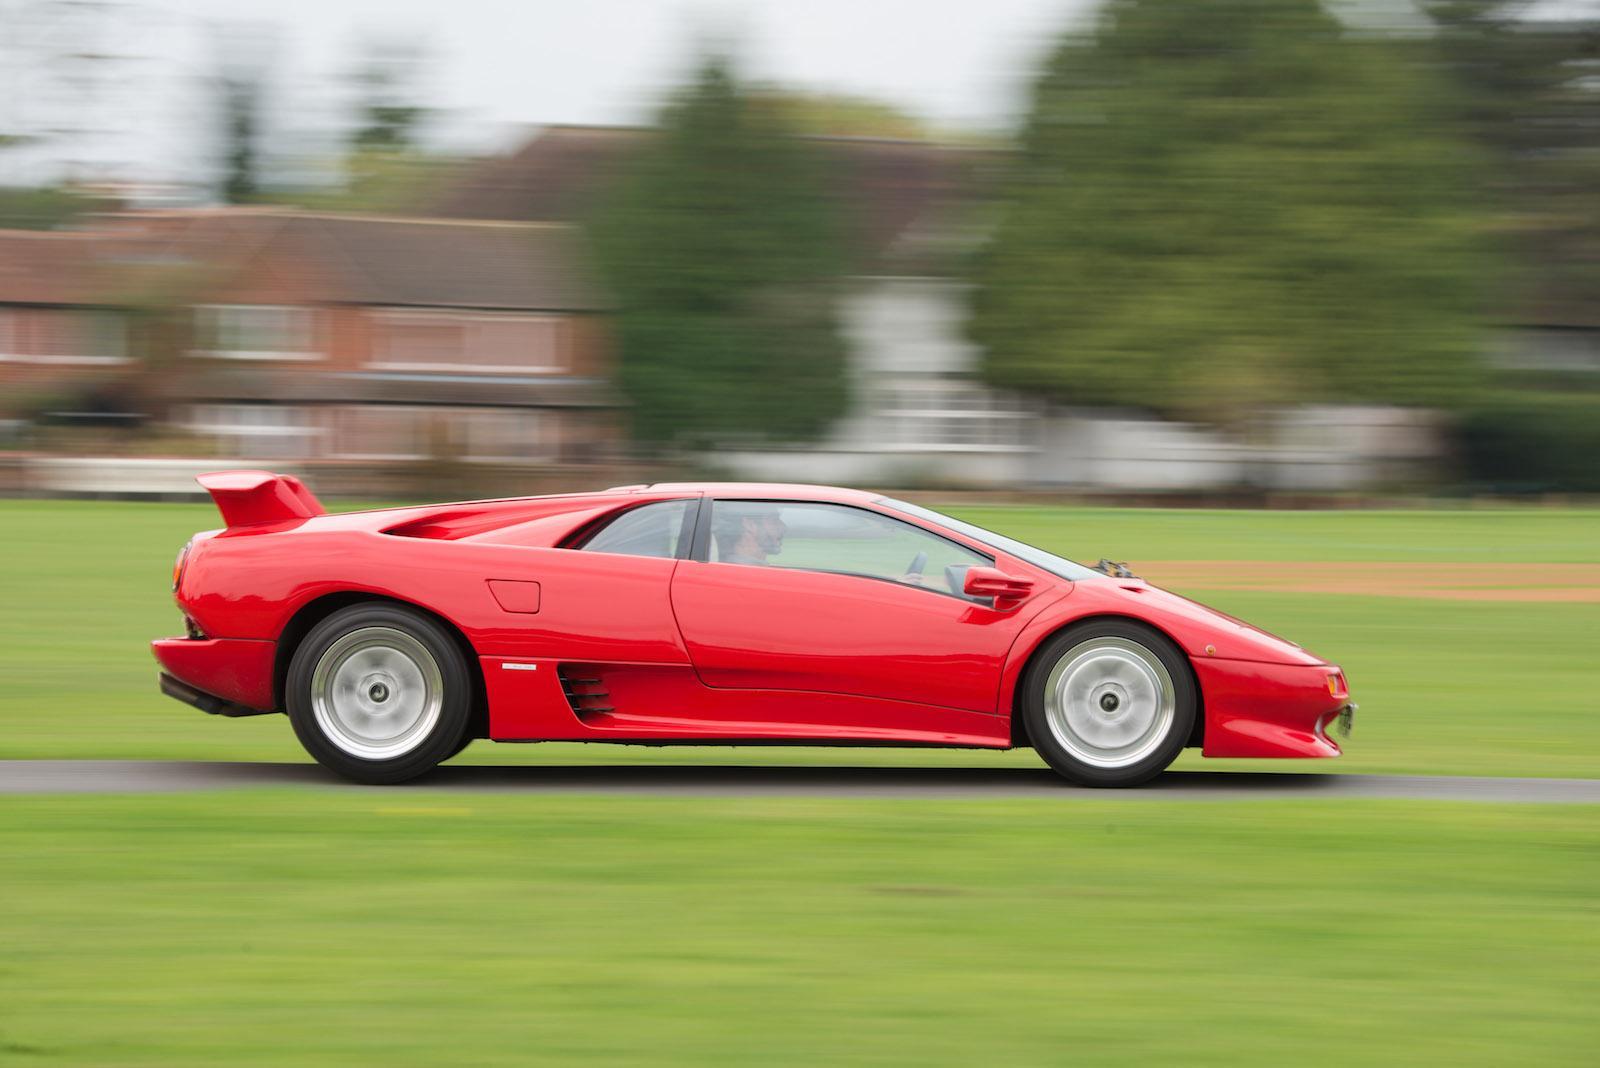 Driving the 8500-mile Diablo